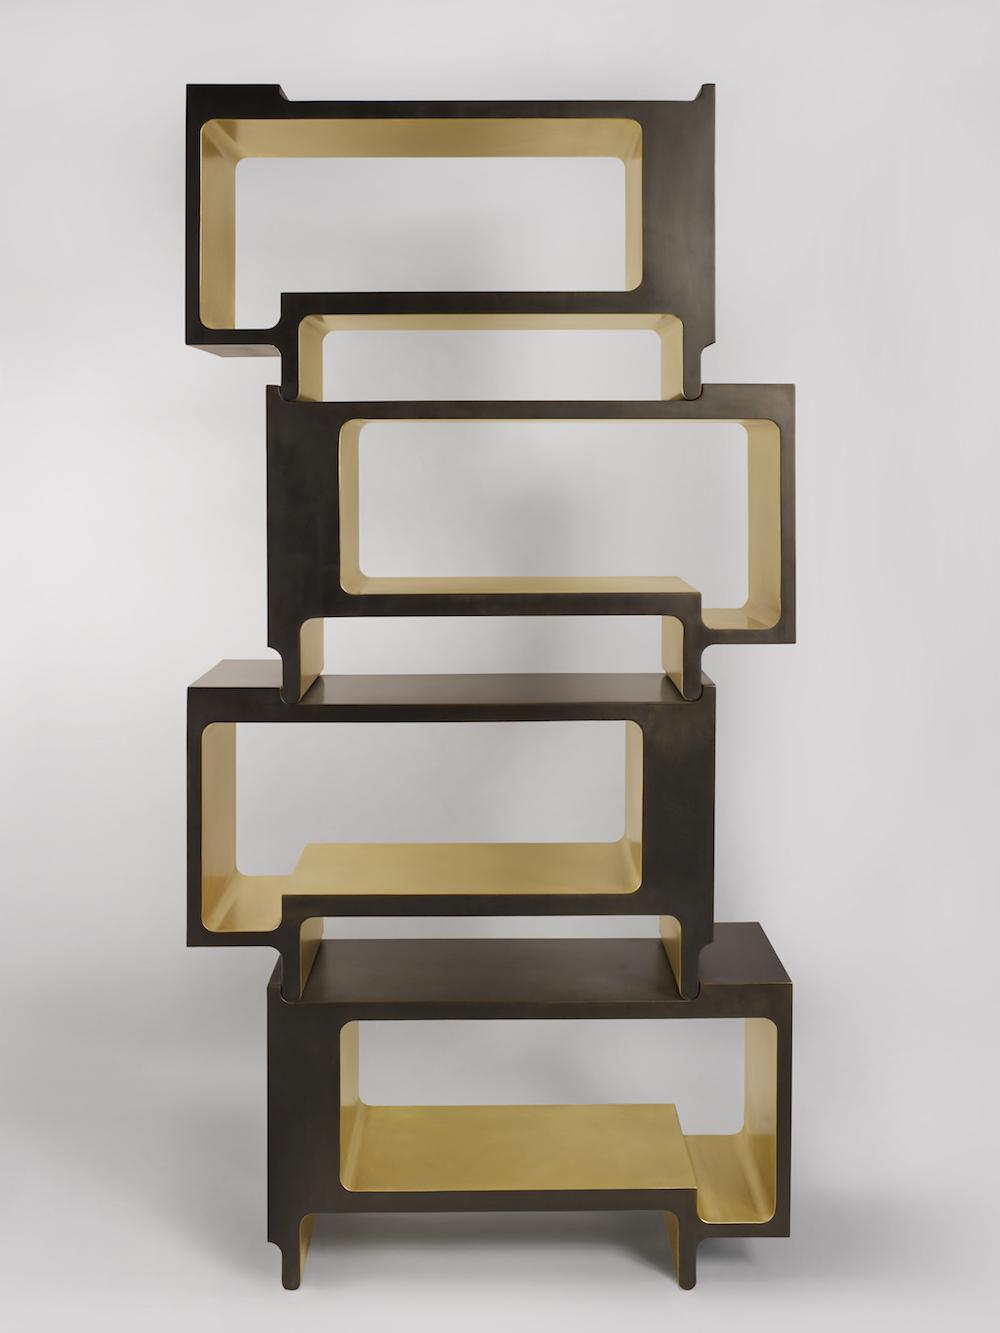 Galerie BSL Bibliothèque Design MVW XiangSheng II Shelving Unit bronze courtsy of Galerie BSL